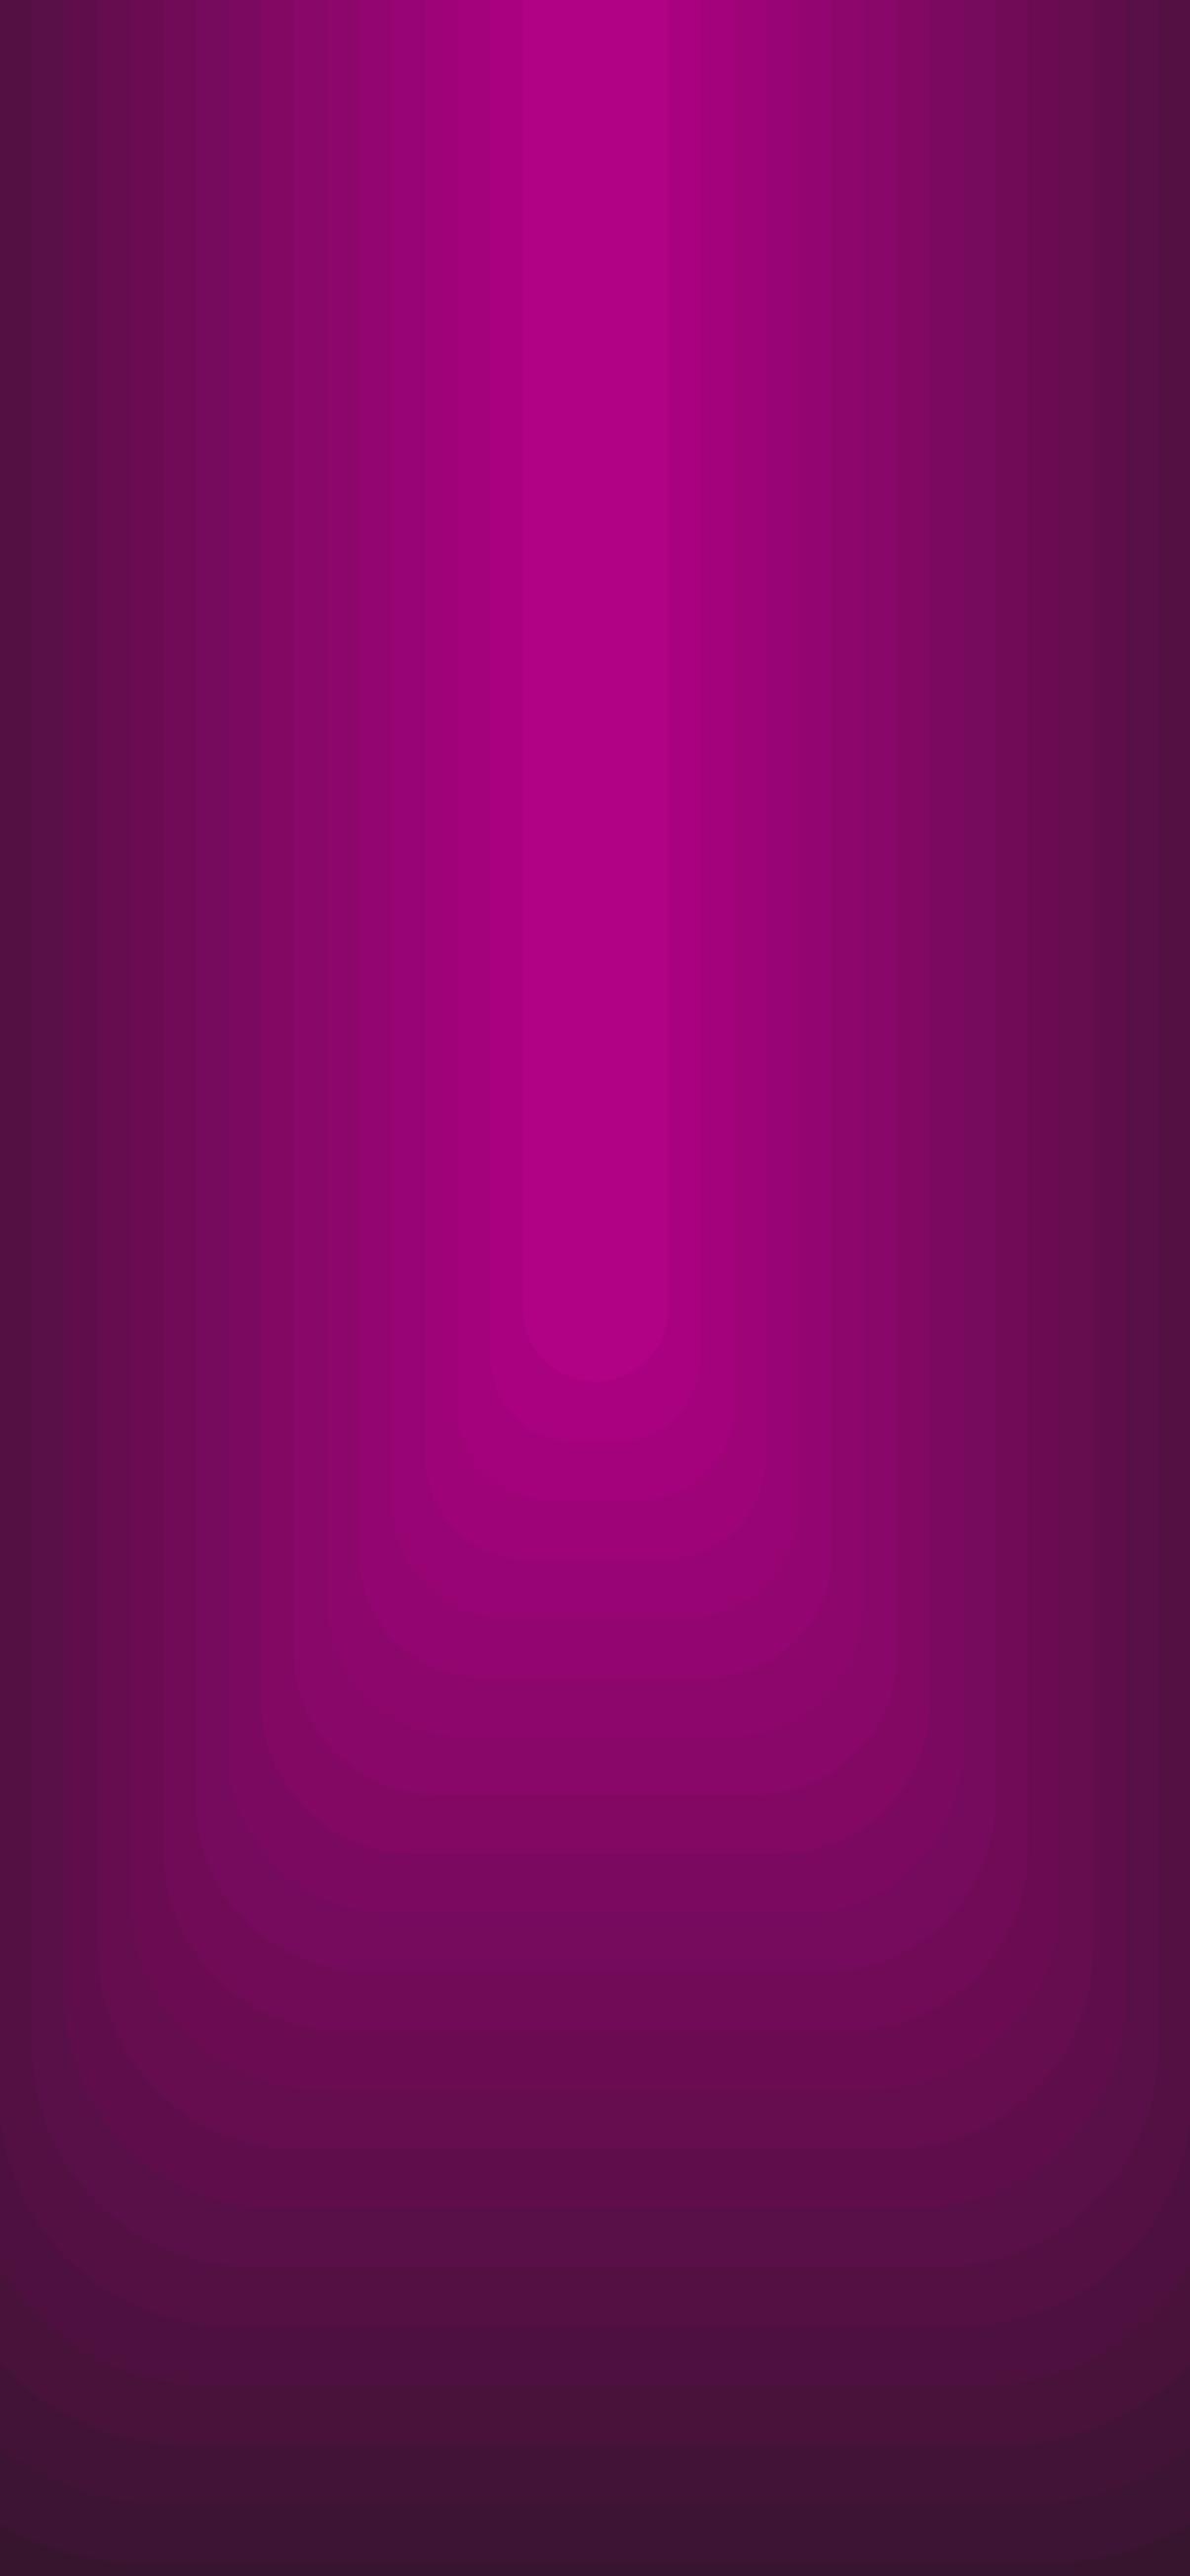 purple.gradient.phone.wallpaper